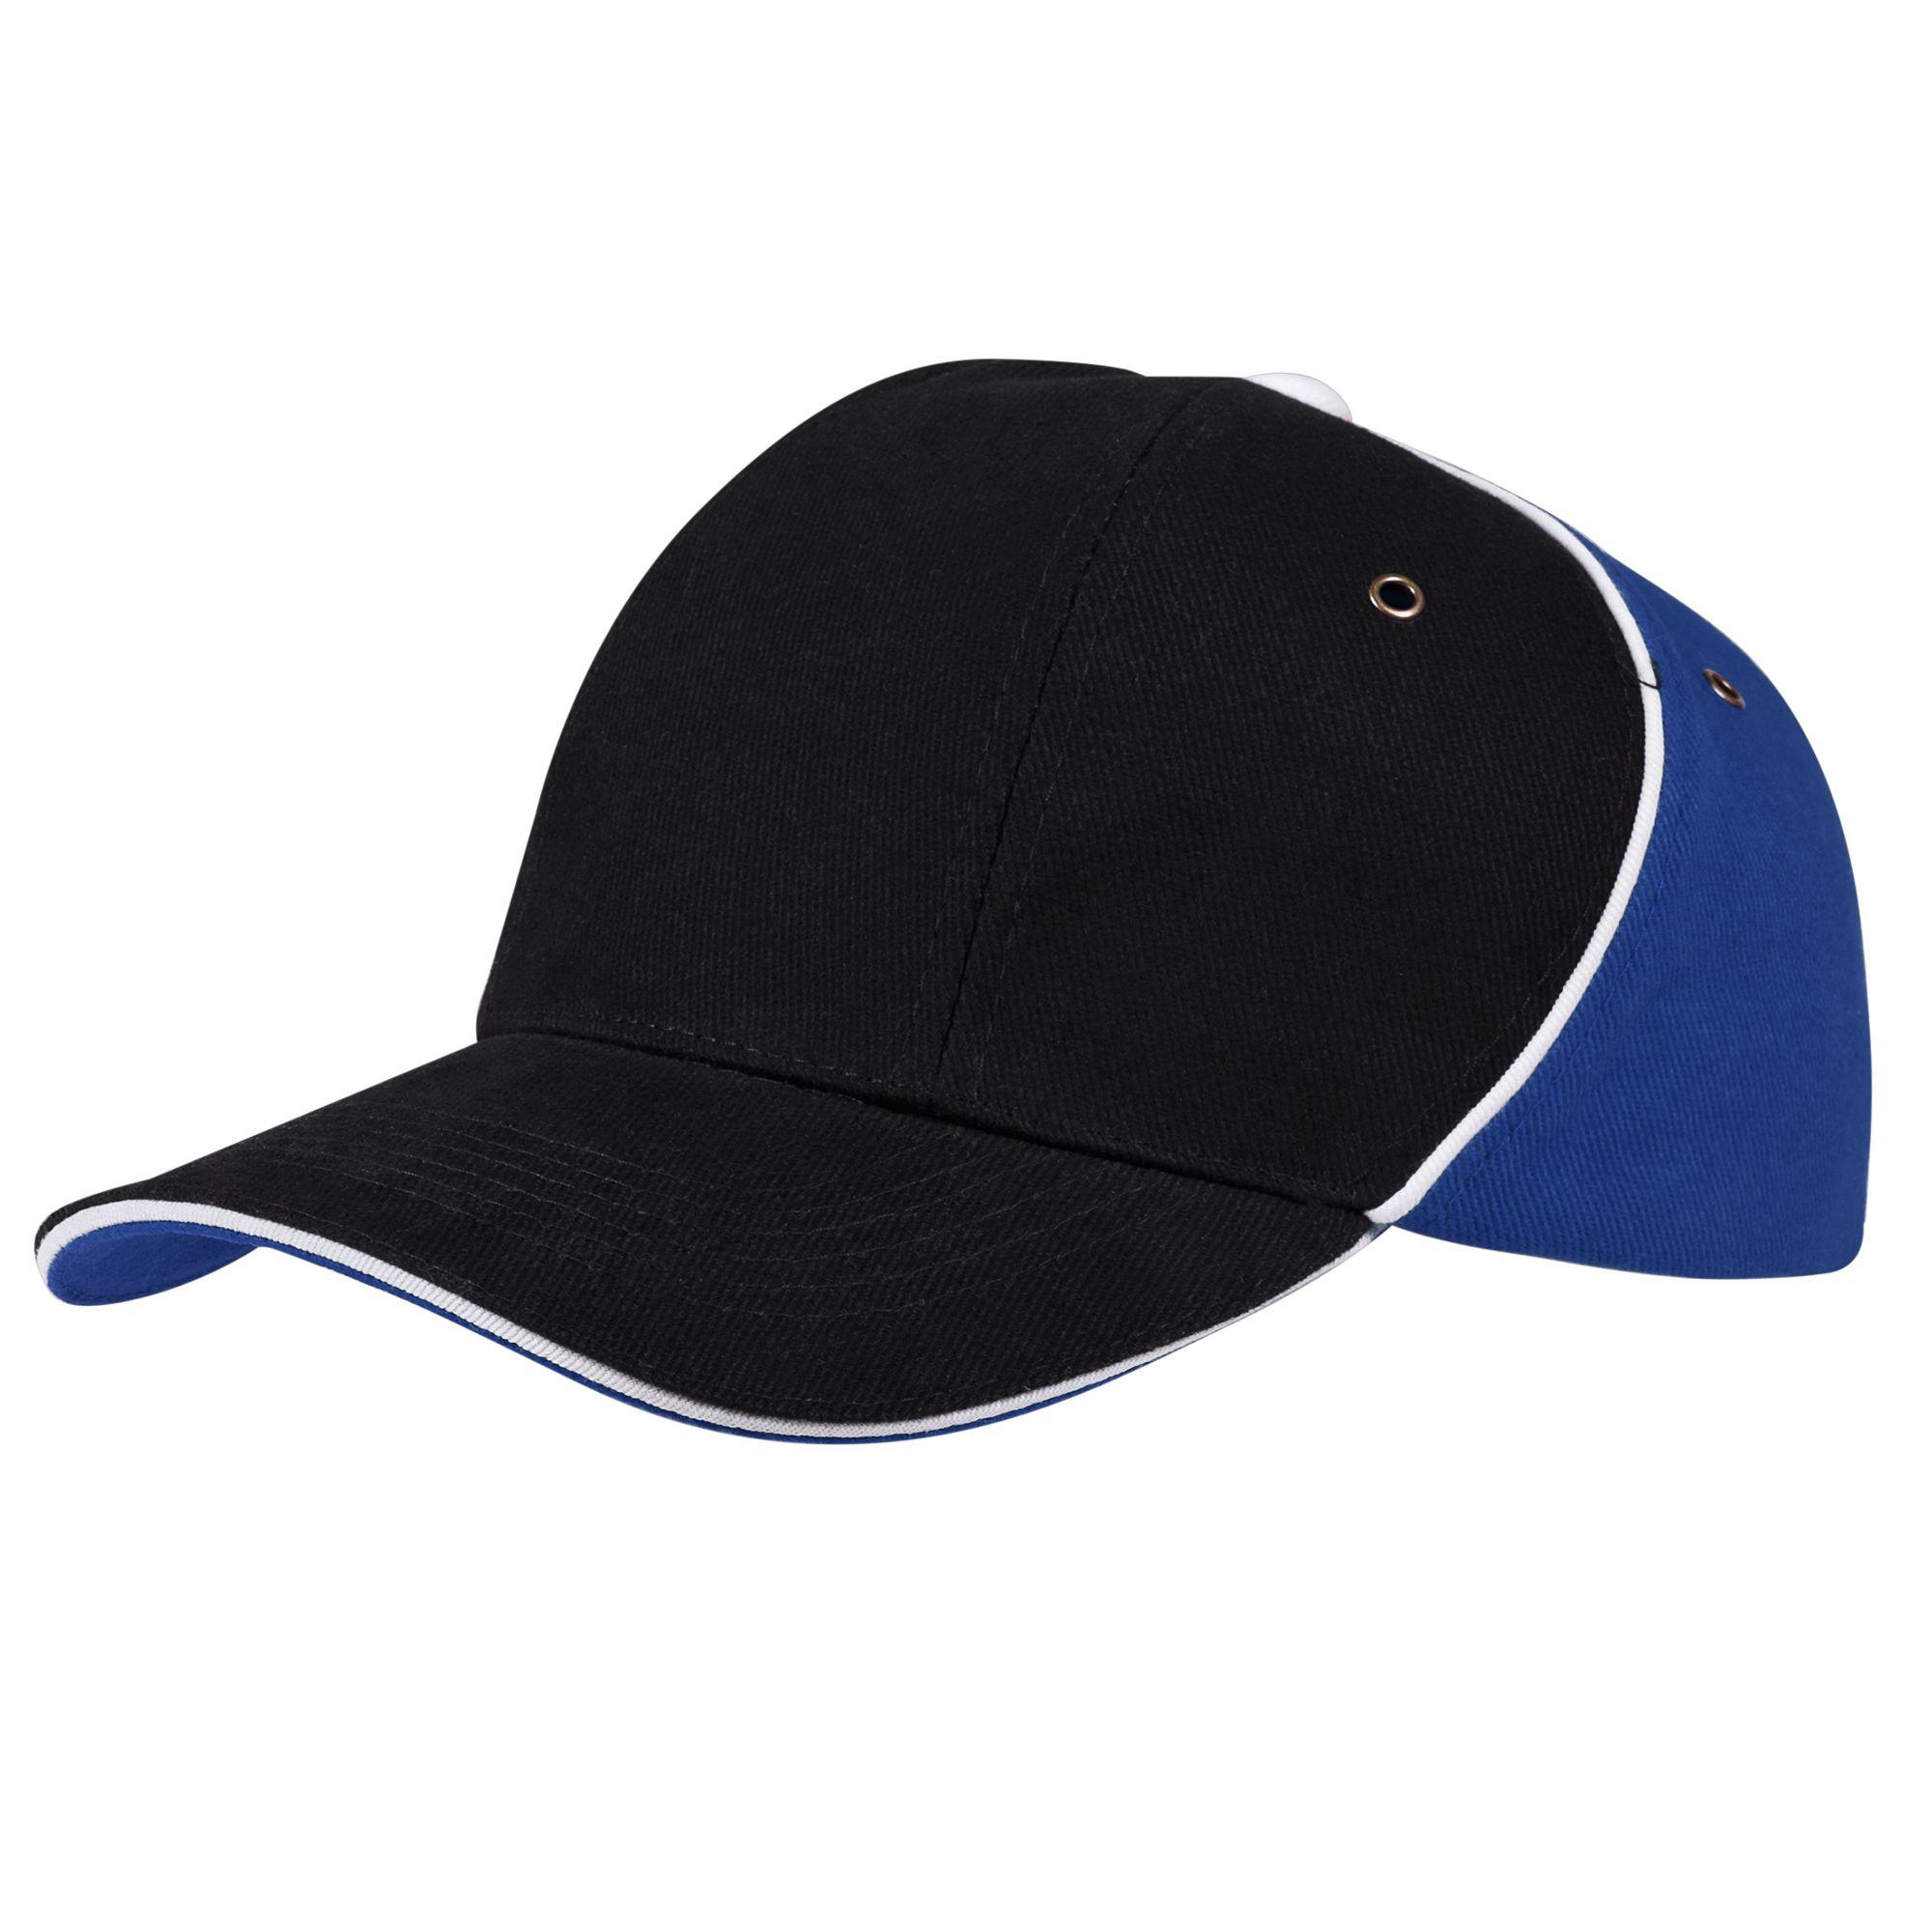 Бейсболка UNIT SMART, черная с синим